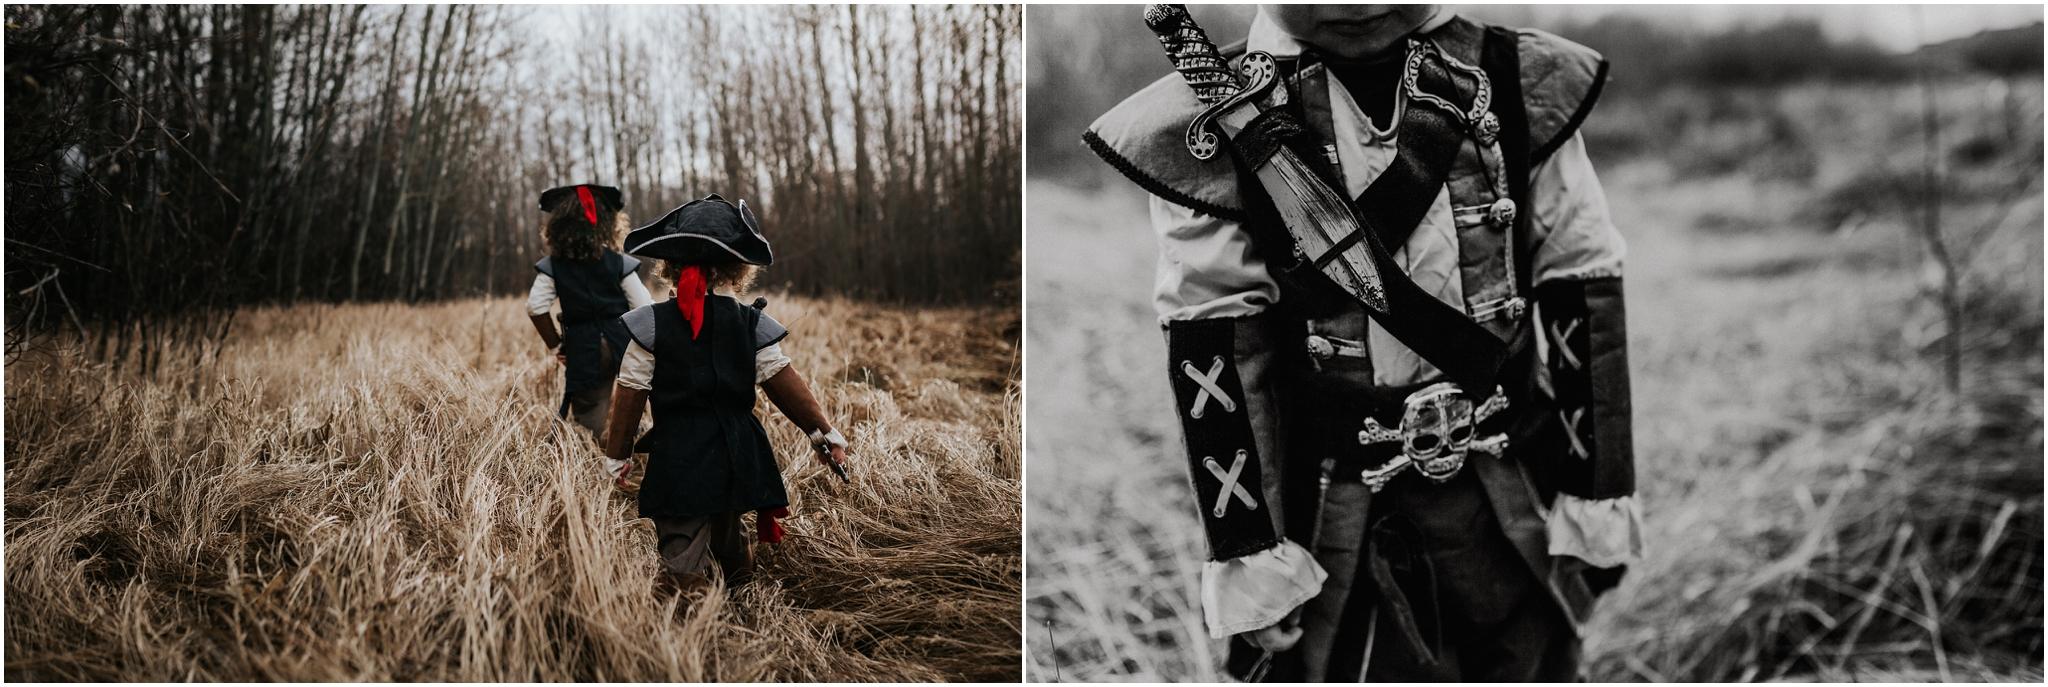 YEG Photographer - Lifestyle Documentary Photography - Halloween Costumes Pirate